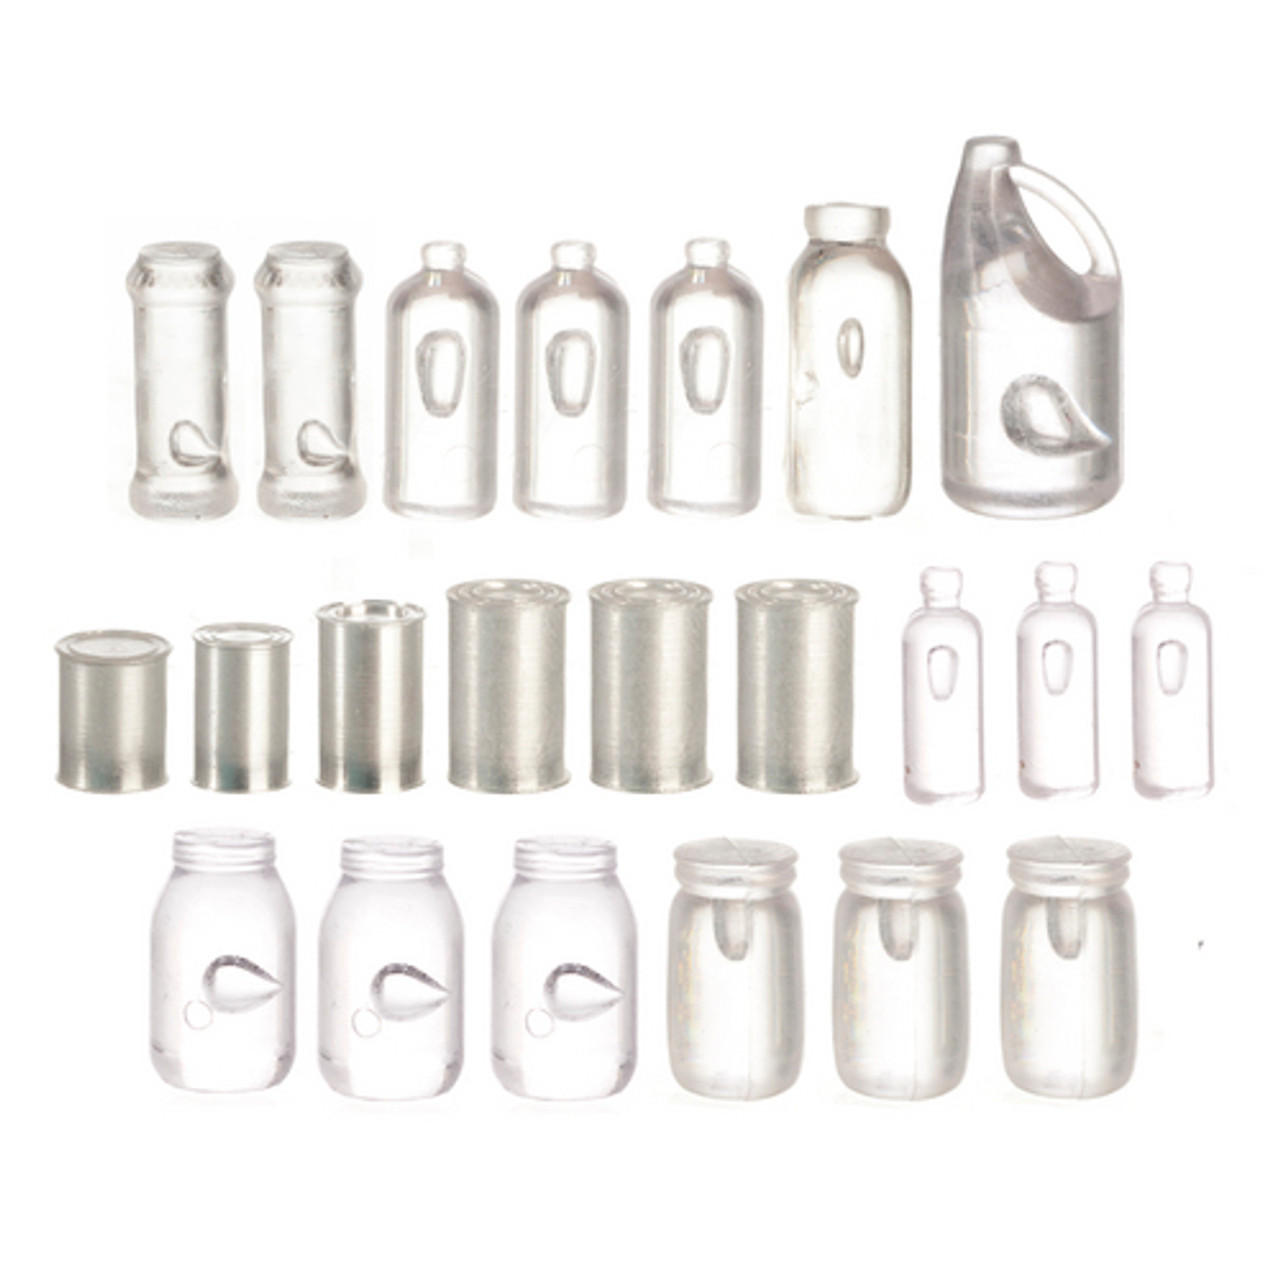 Potpourri Jars Set - Assorted